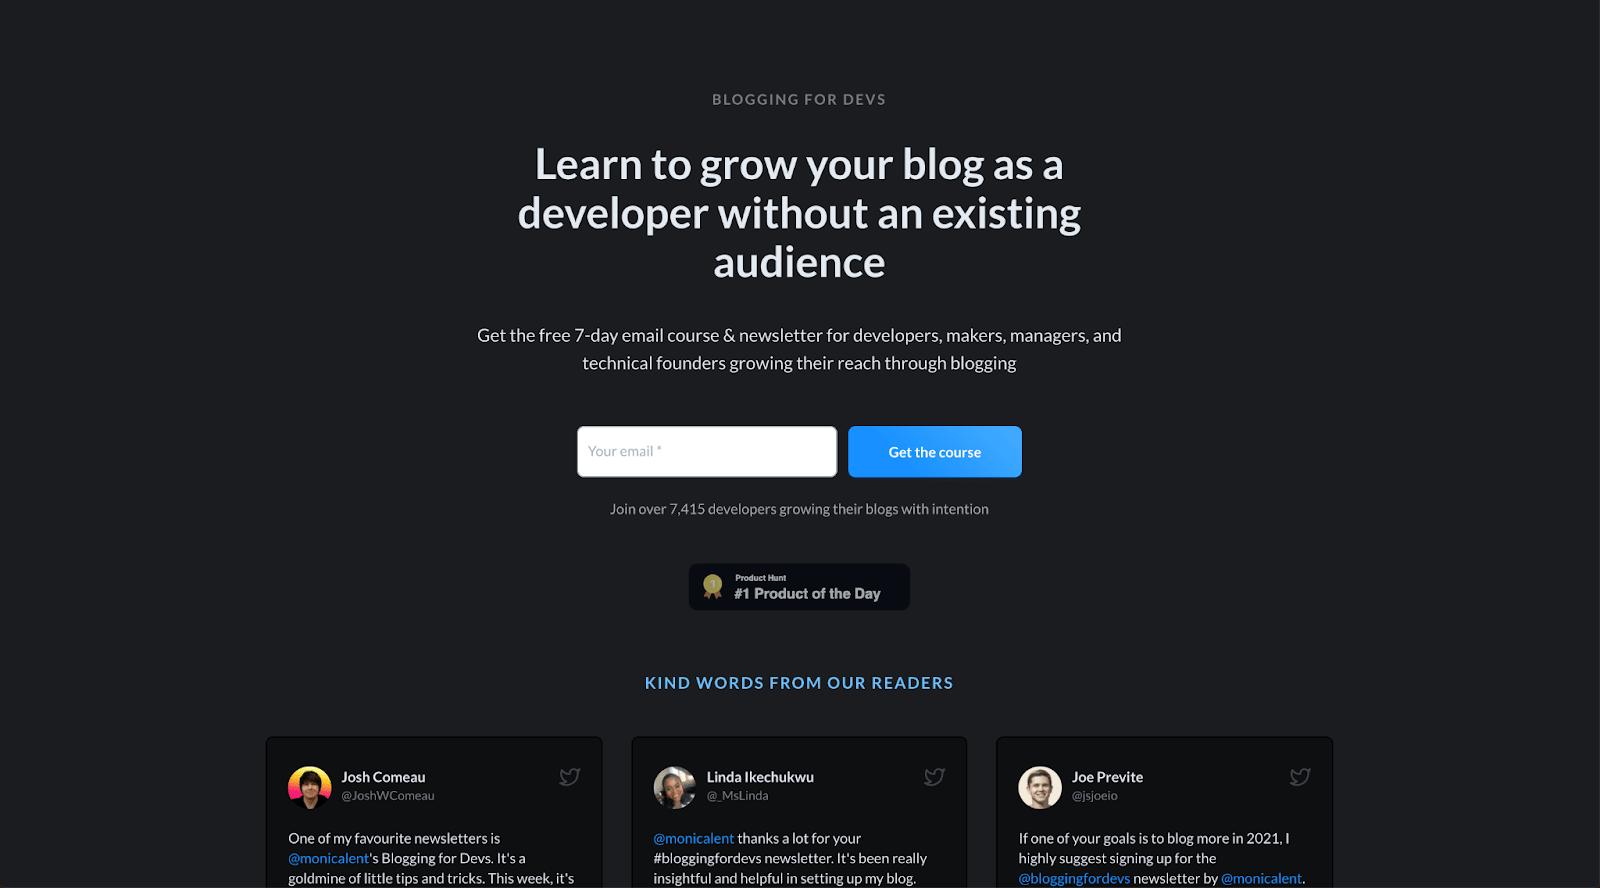 Blogging for Devs Landing Page